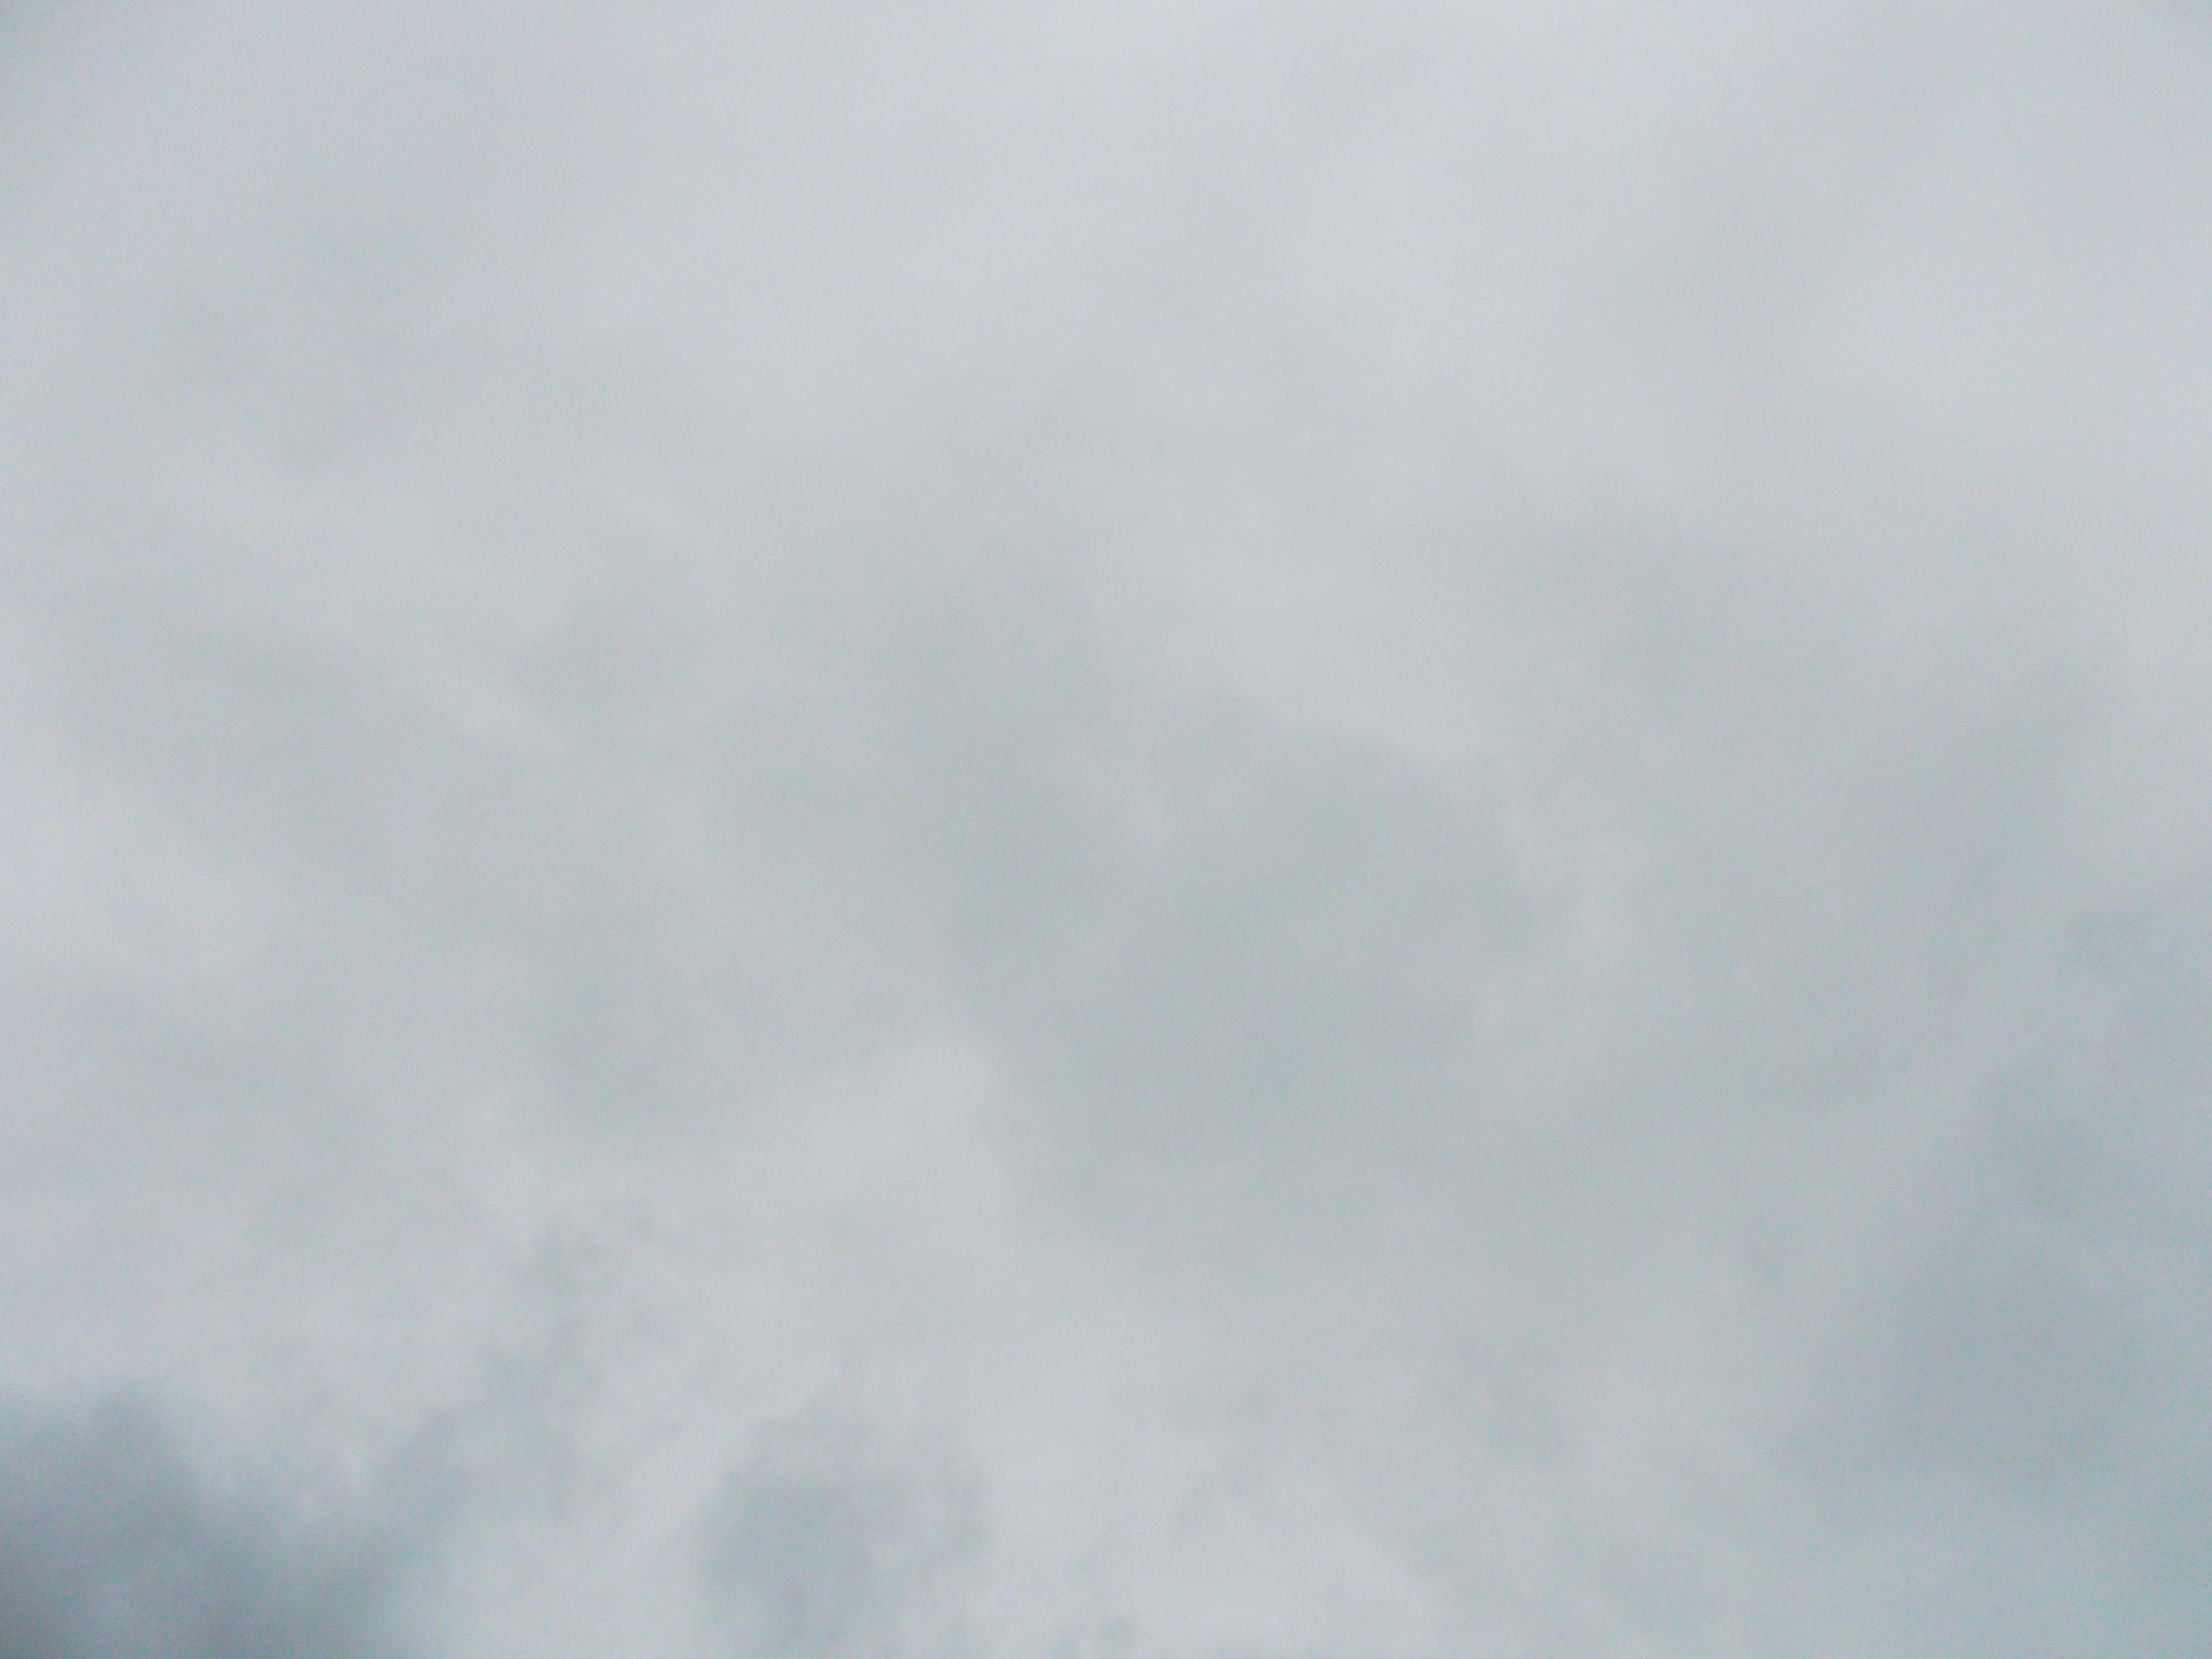 2013-04-13 Longitude -0.371 Latitude 49.182 Altitude 29 Heure 11h37